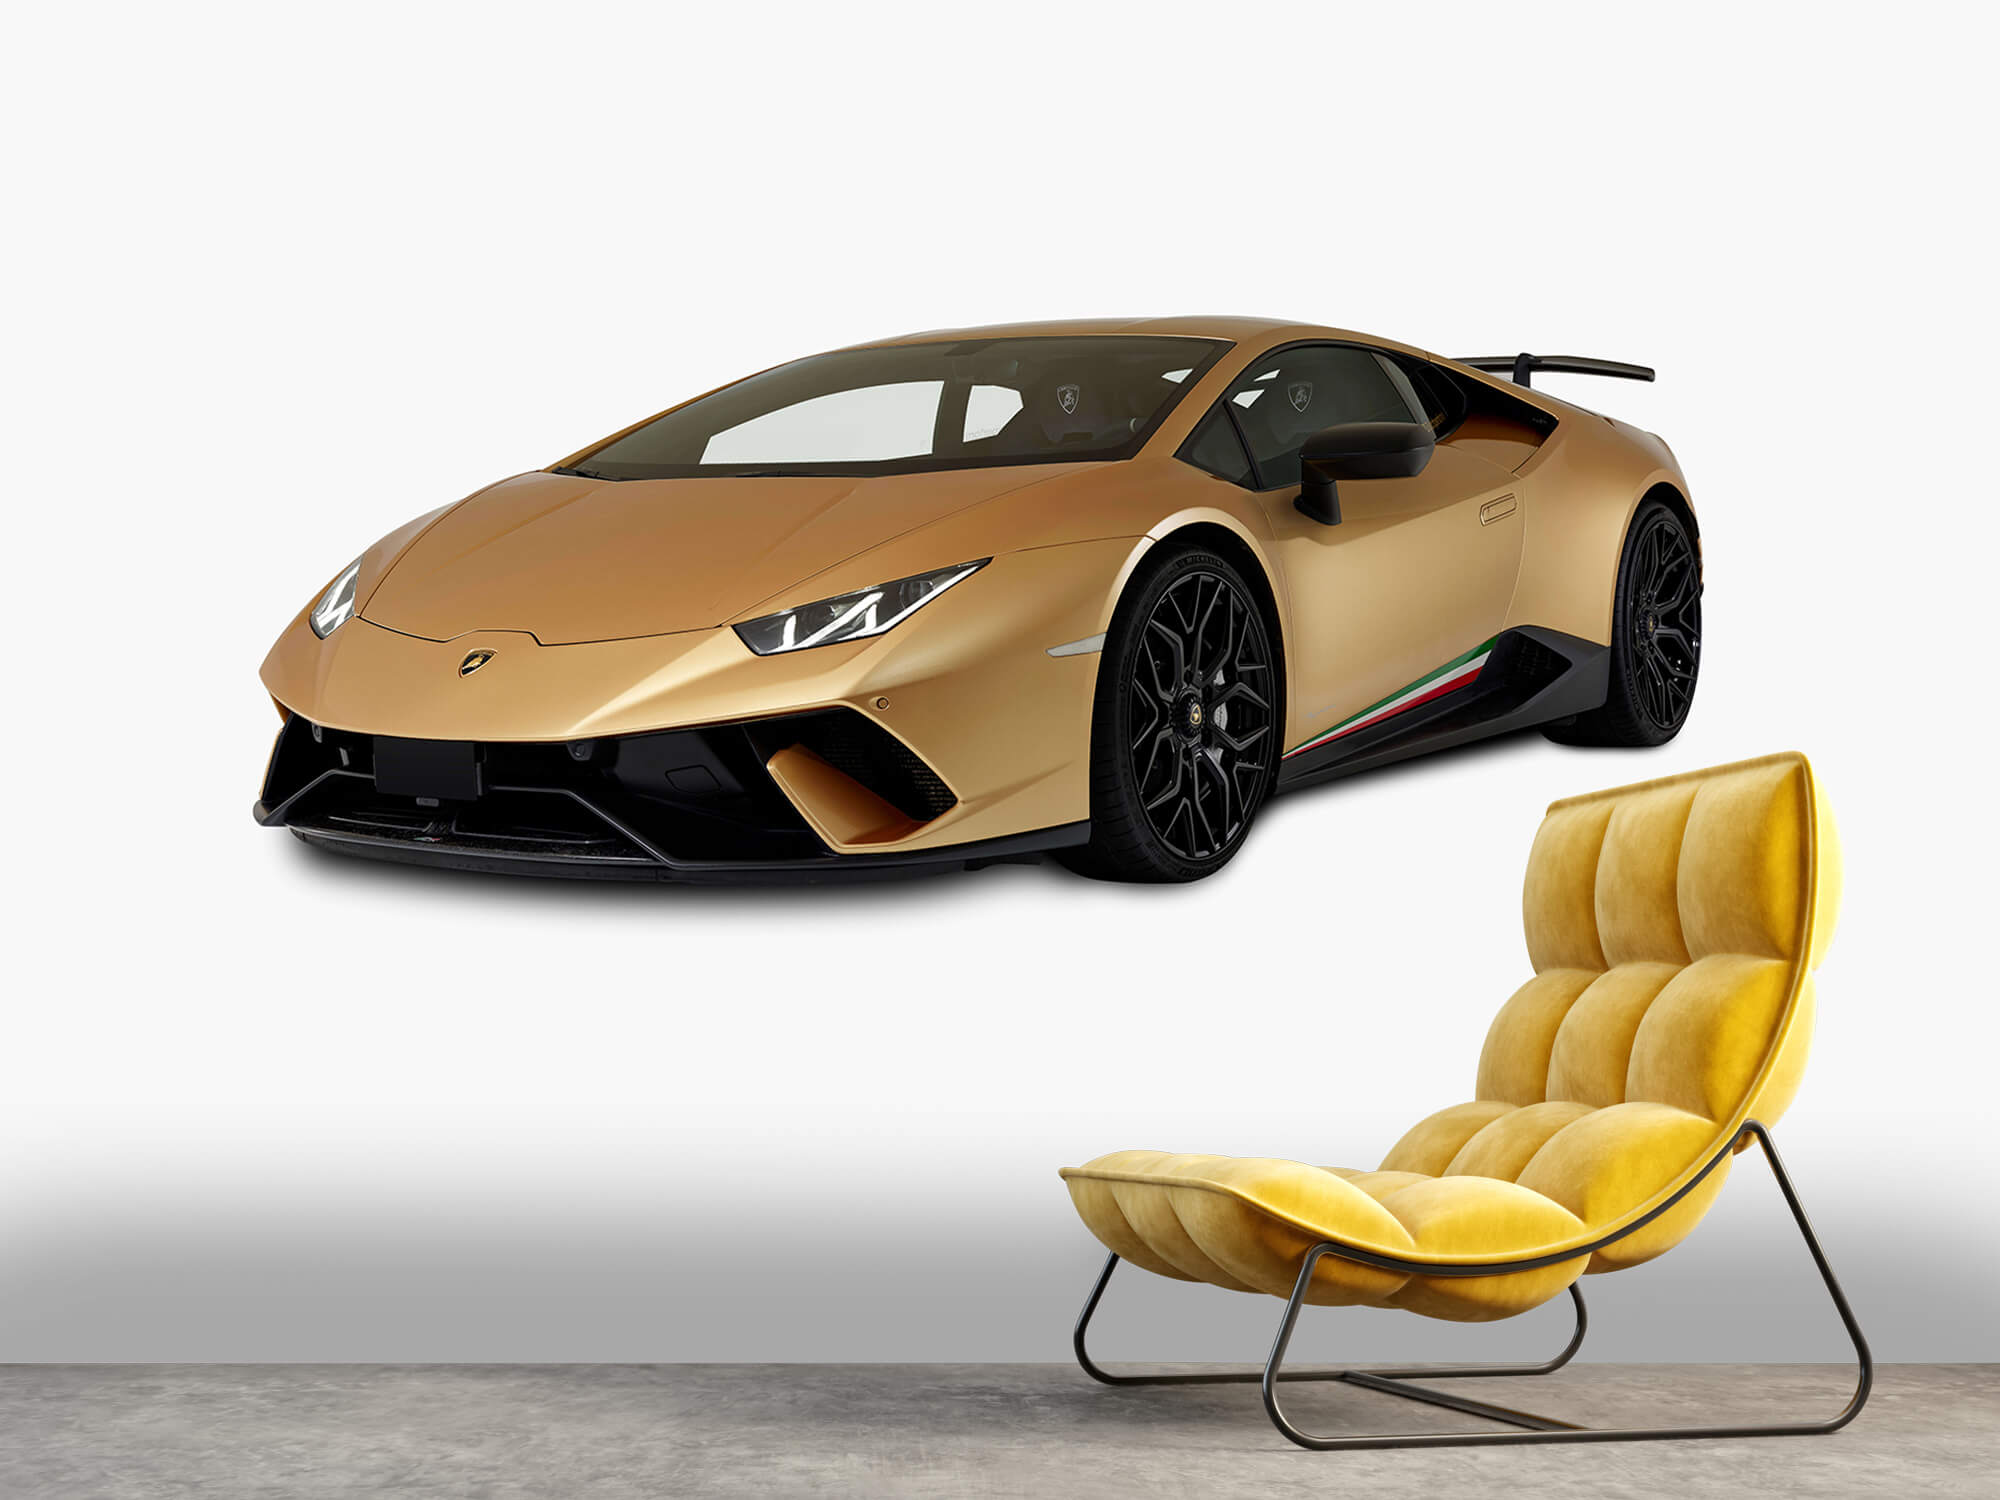 Wallpaper Lamborghini Huracán - Avant droit, blanc 7